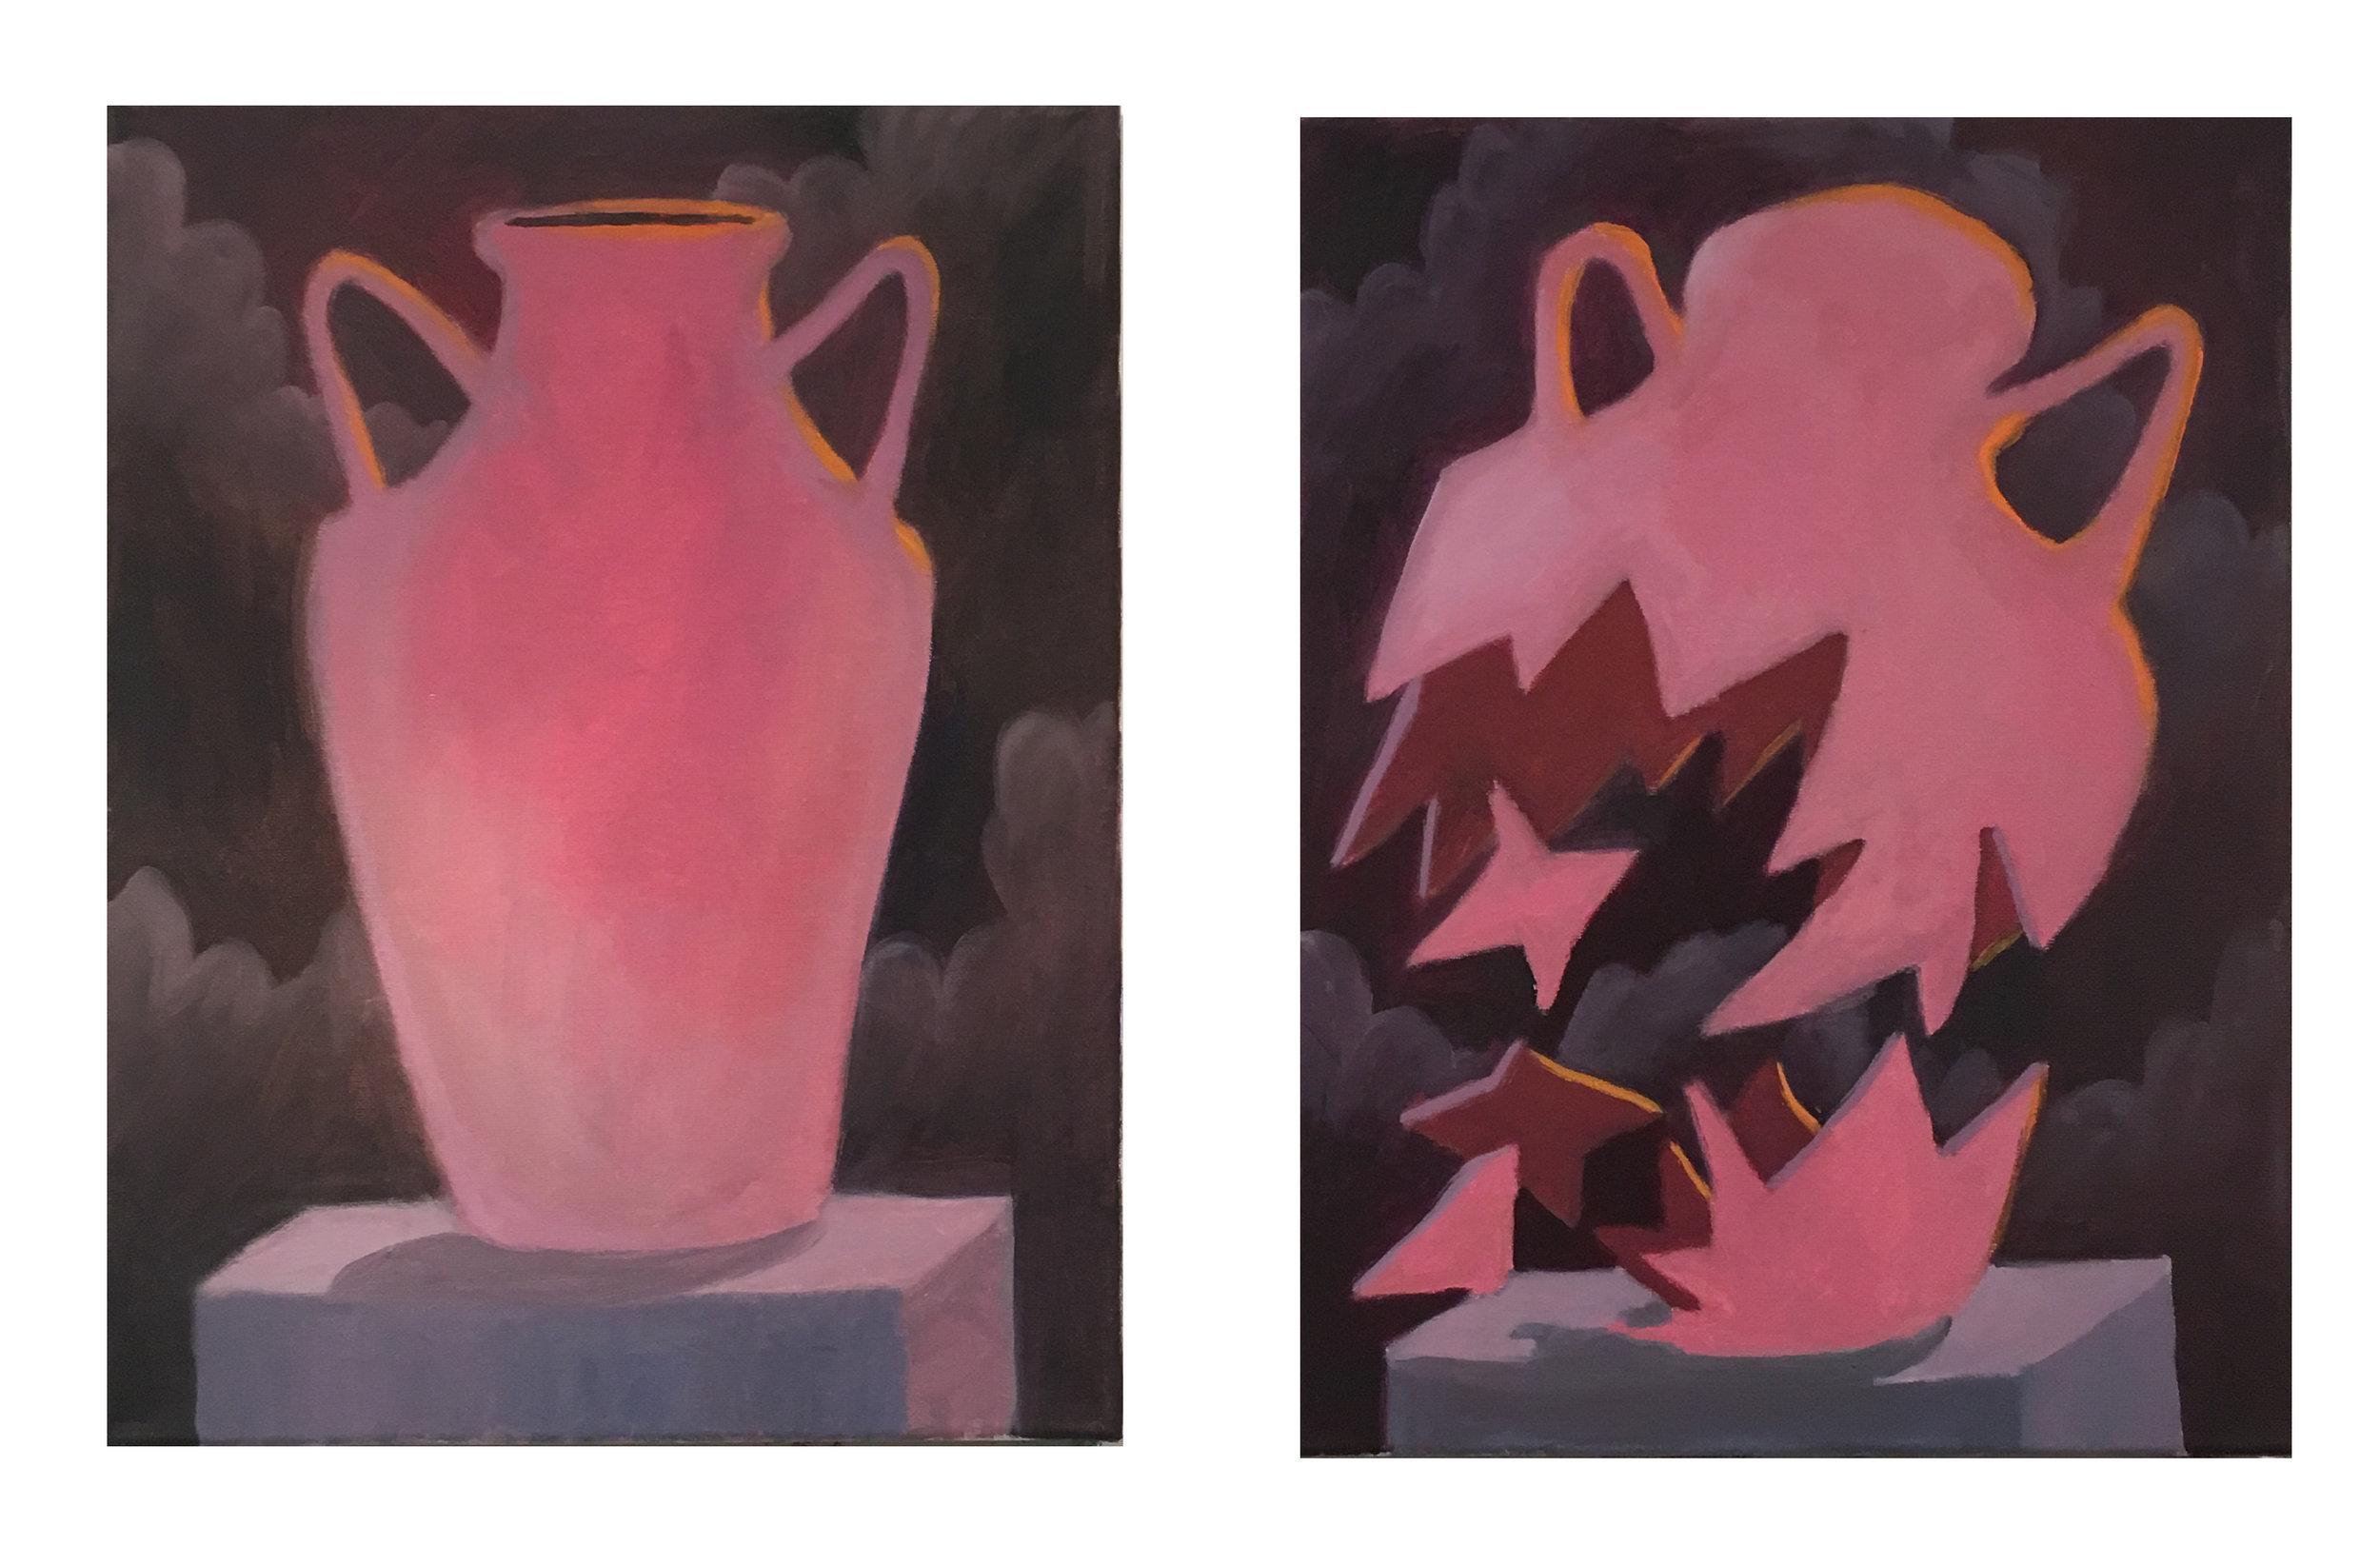 Vase 1, Vase 2 oil on canvas 12 x 16 inches each 2017